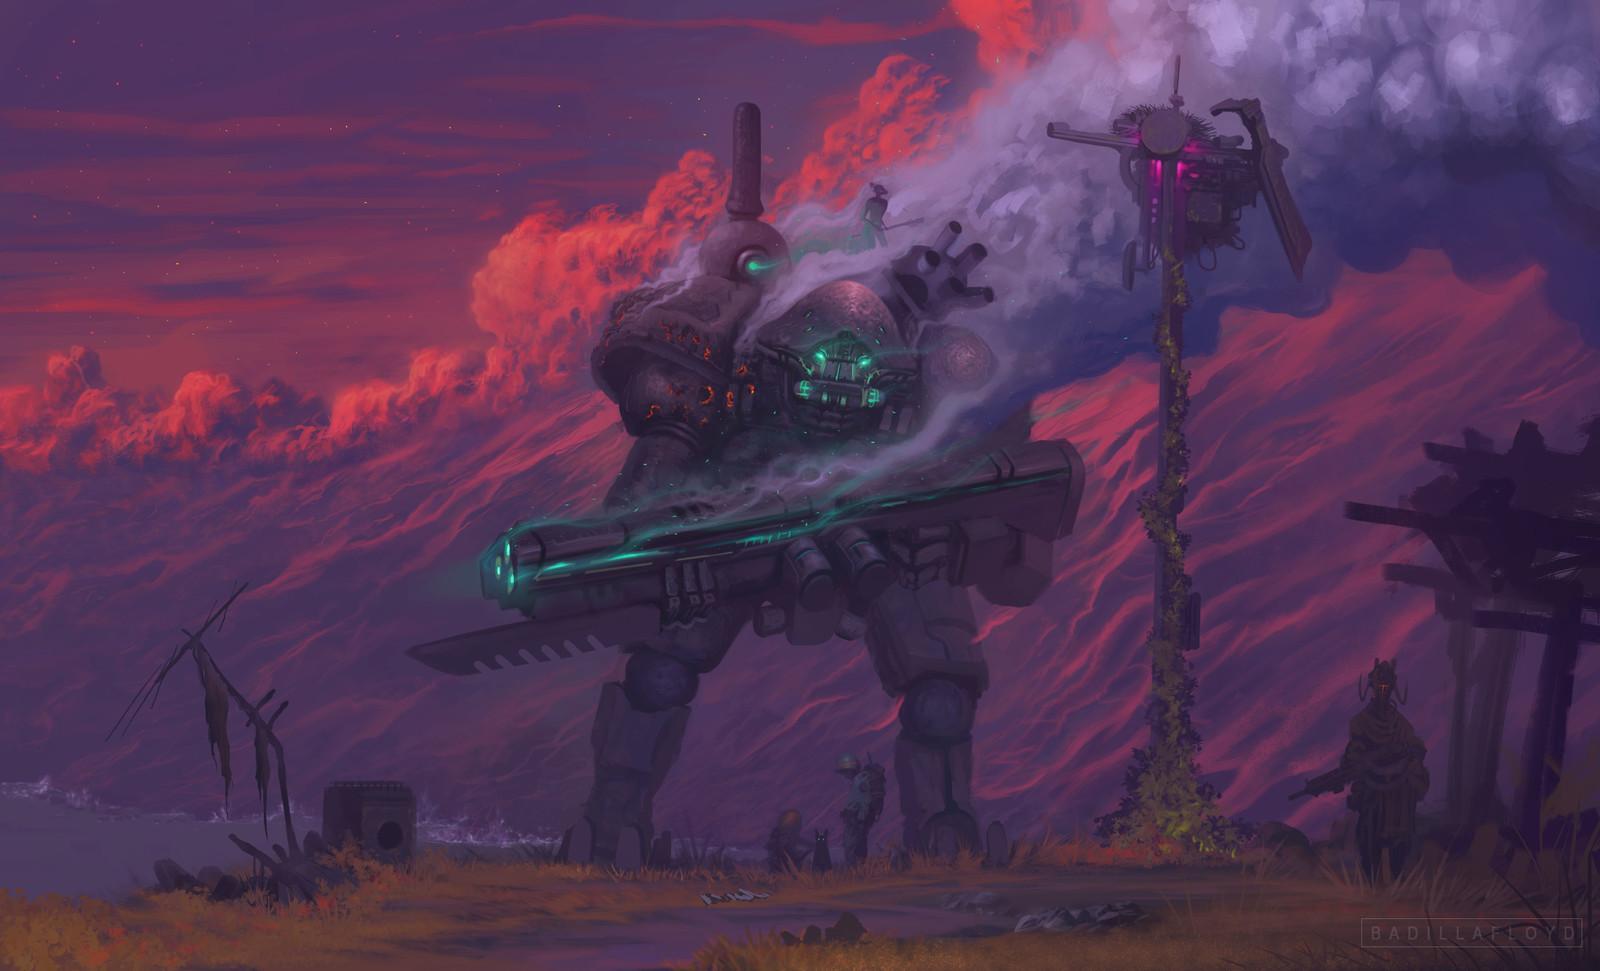 Nubes Finales - Artwork